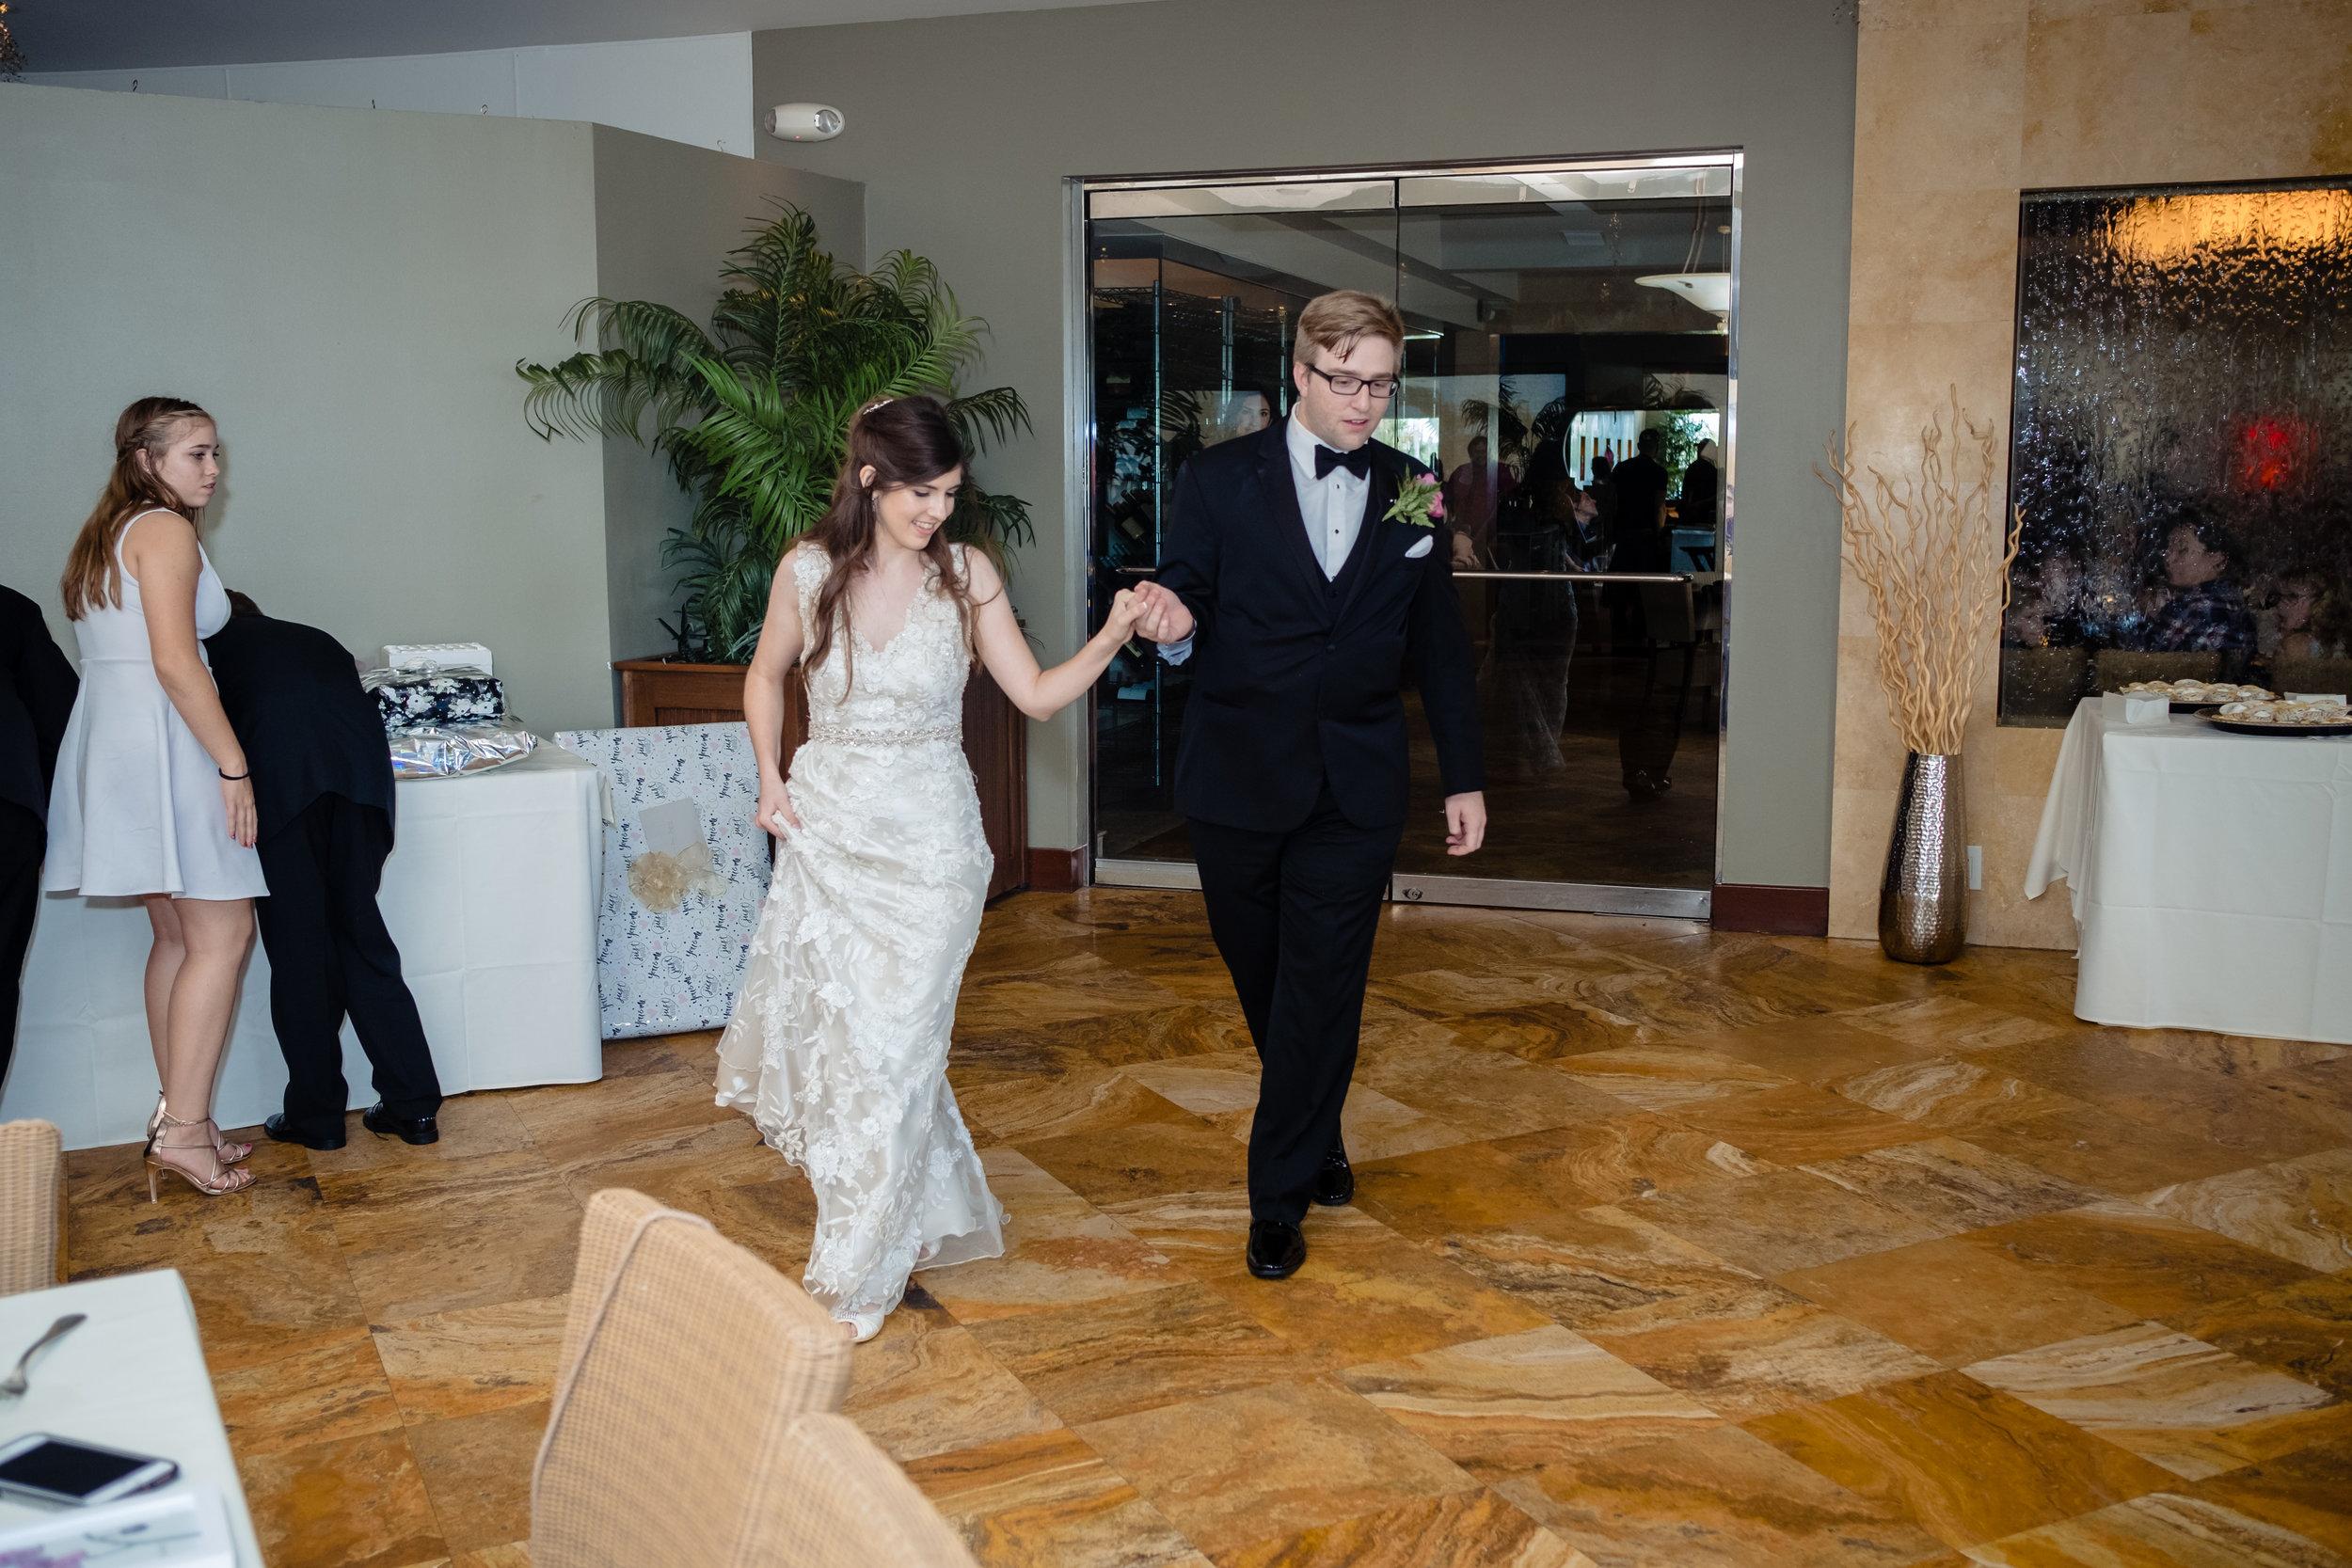 HAH_Zoe and Daniel_Clearwater Wedding_511_2018.jpg